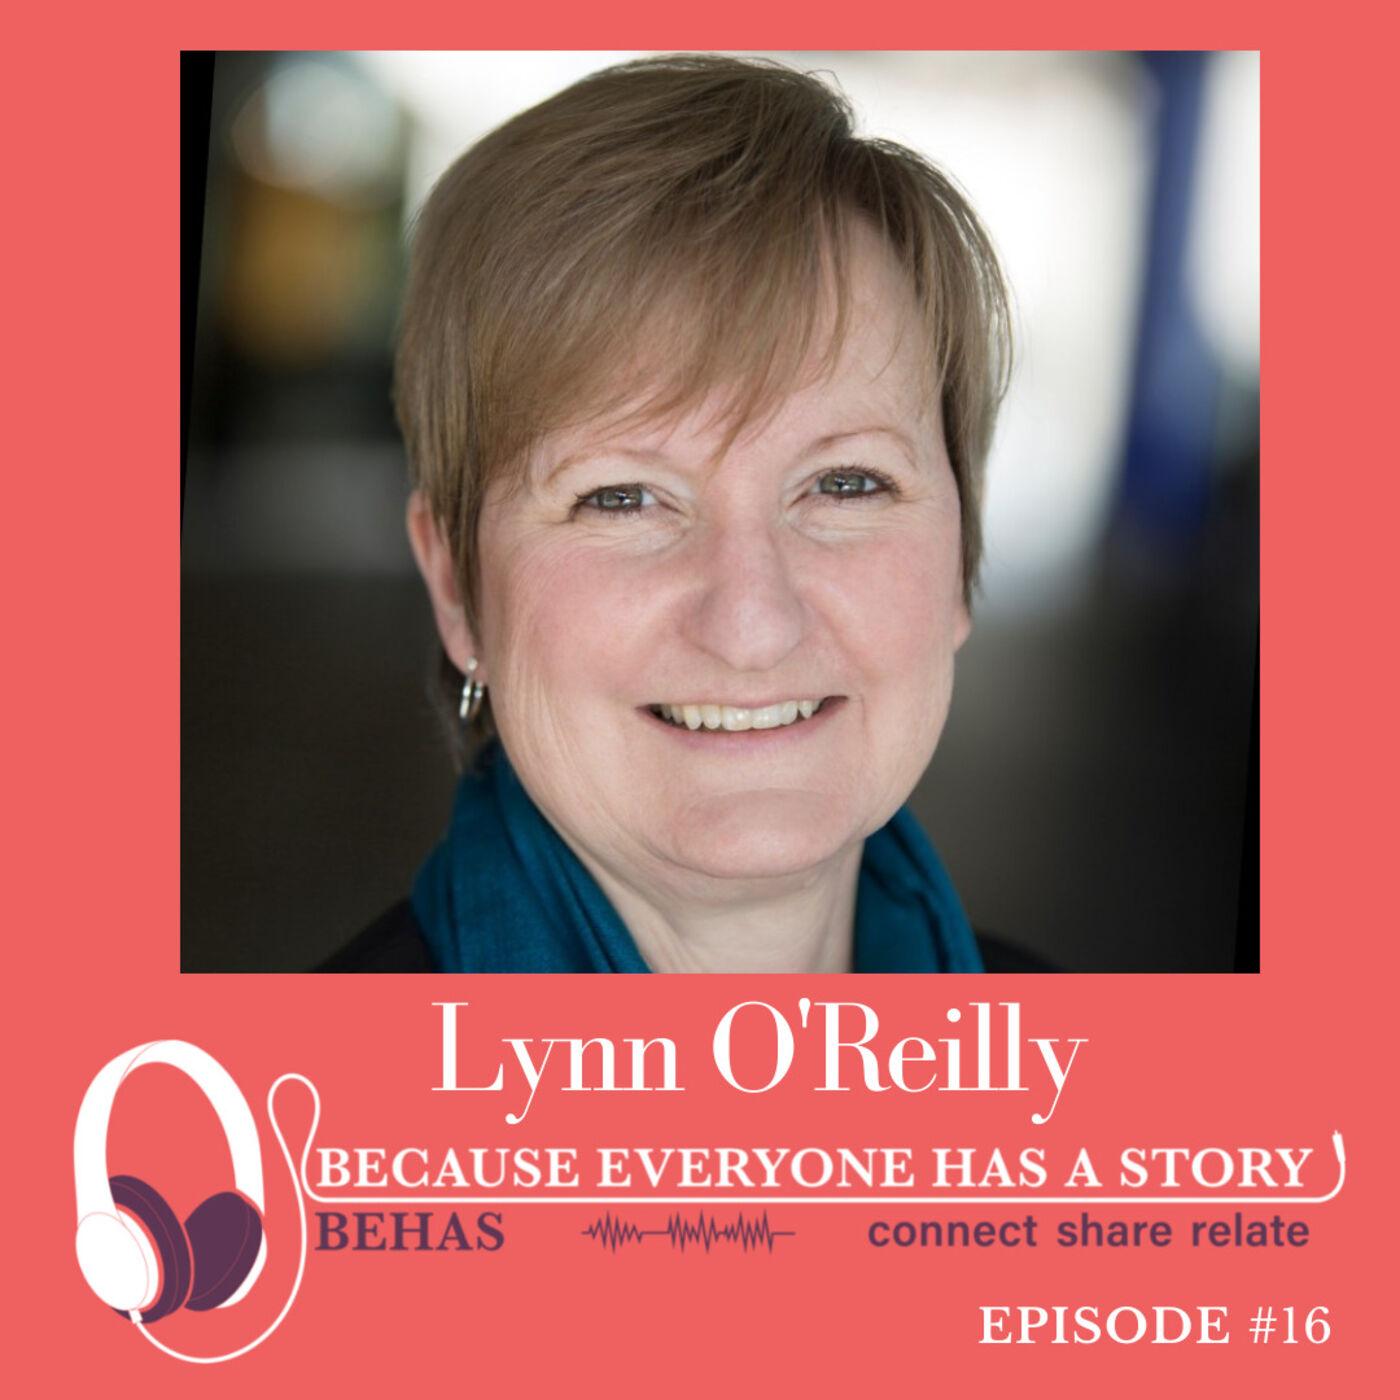 #16 - Adventures of a Rookie Motorcyclist - Lynn O'Reilly